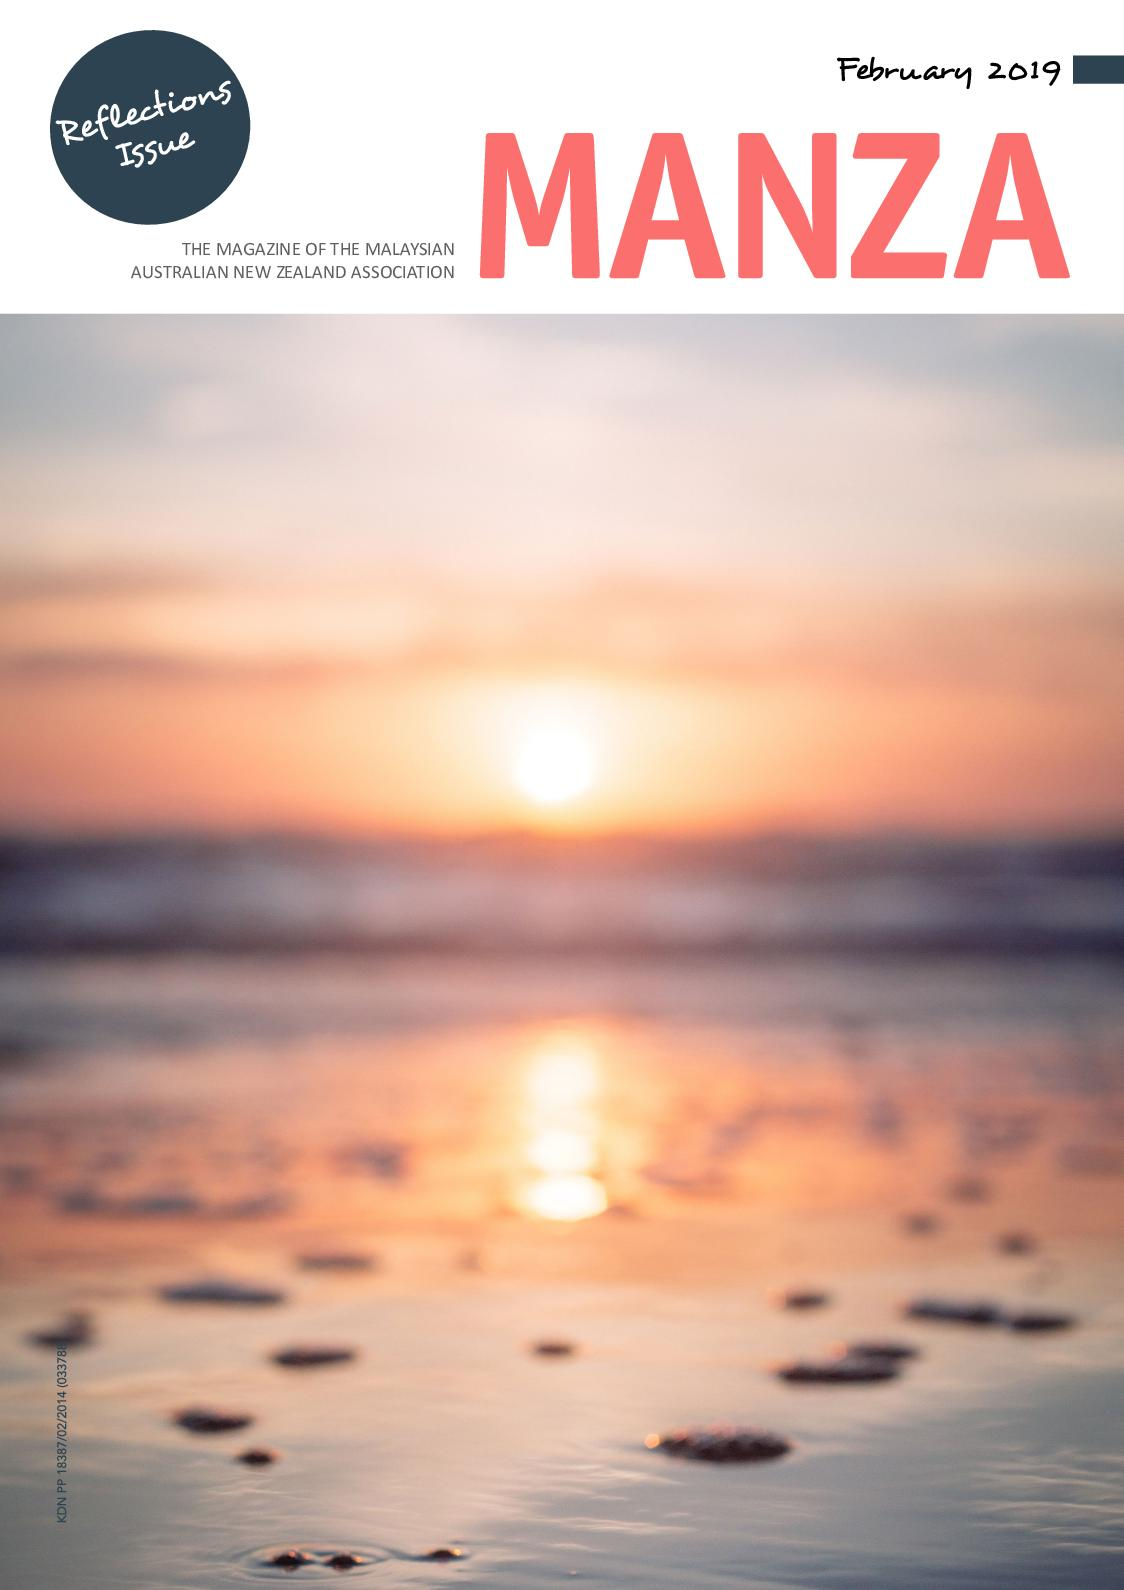 Calaméo - Manza February 2019